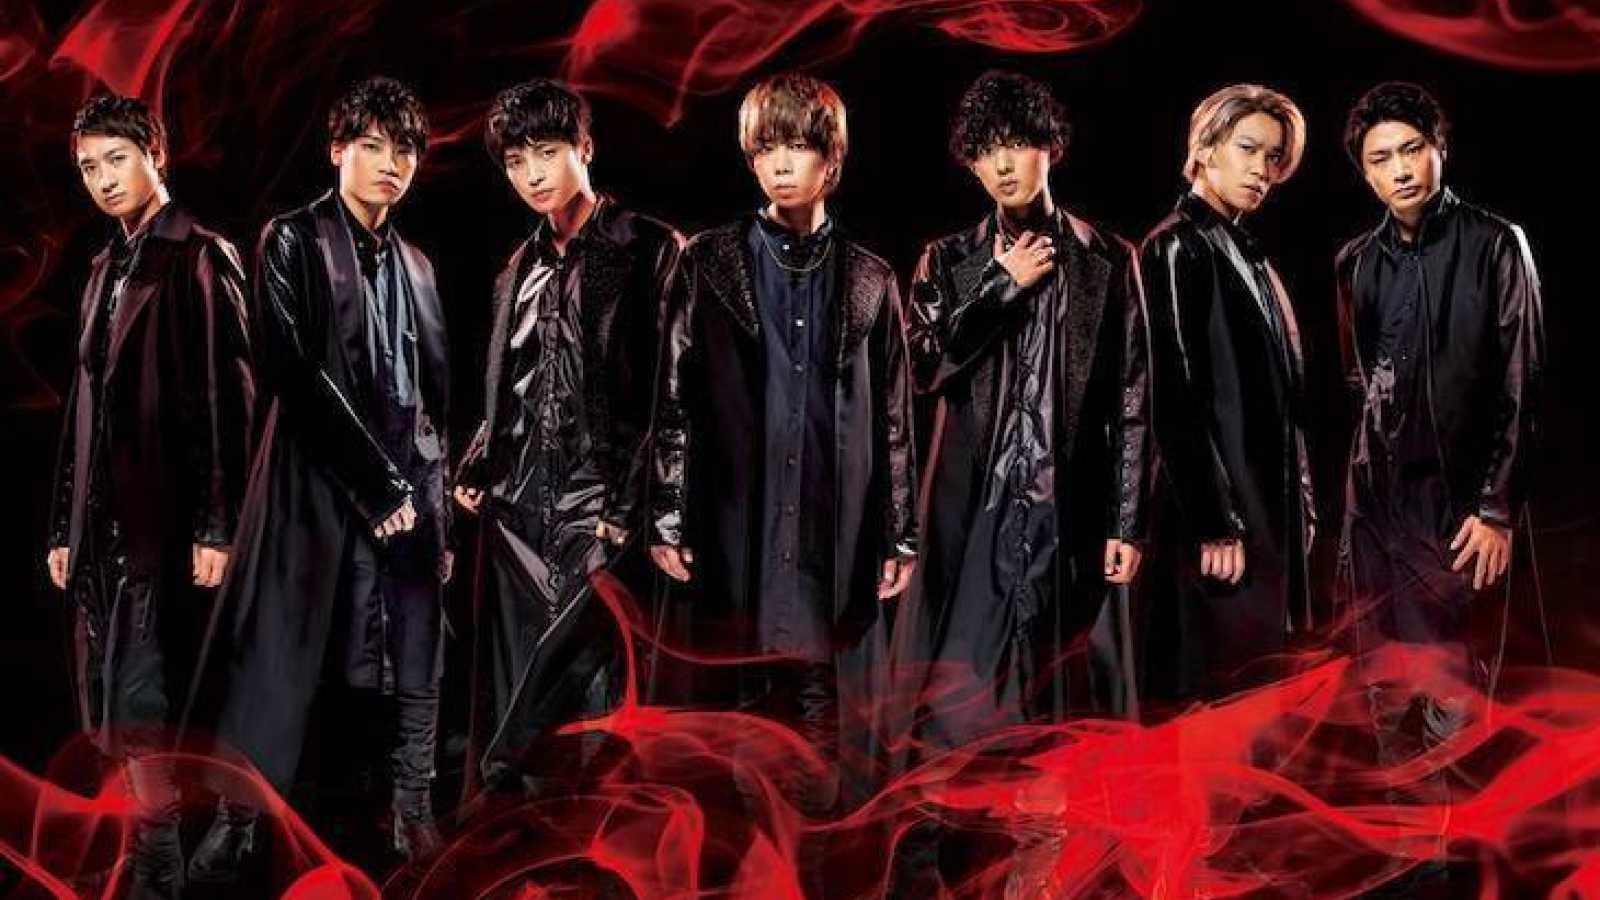 Новый альбом Kis-My-Ft2 © Kis-My-Ft2. All rights reserved.